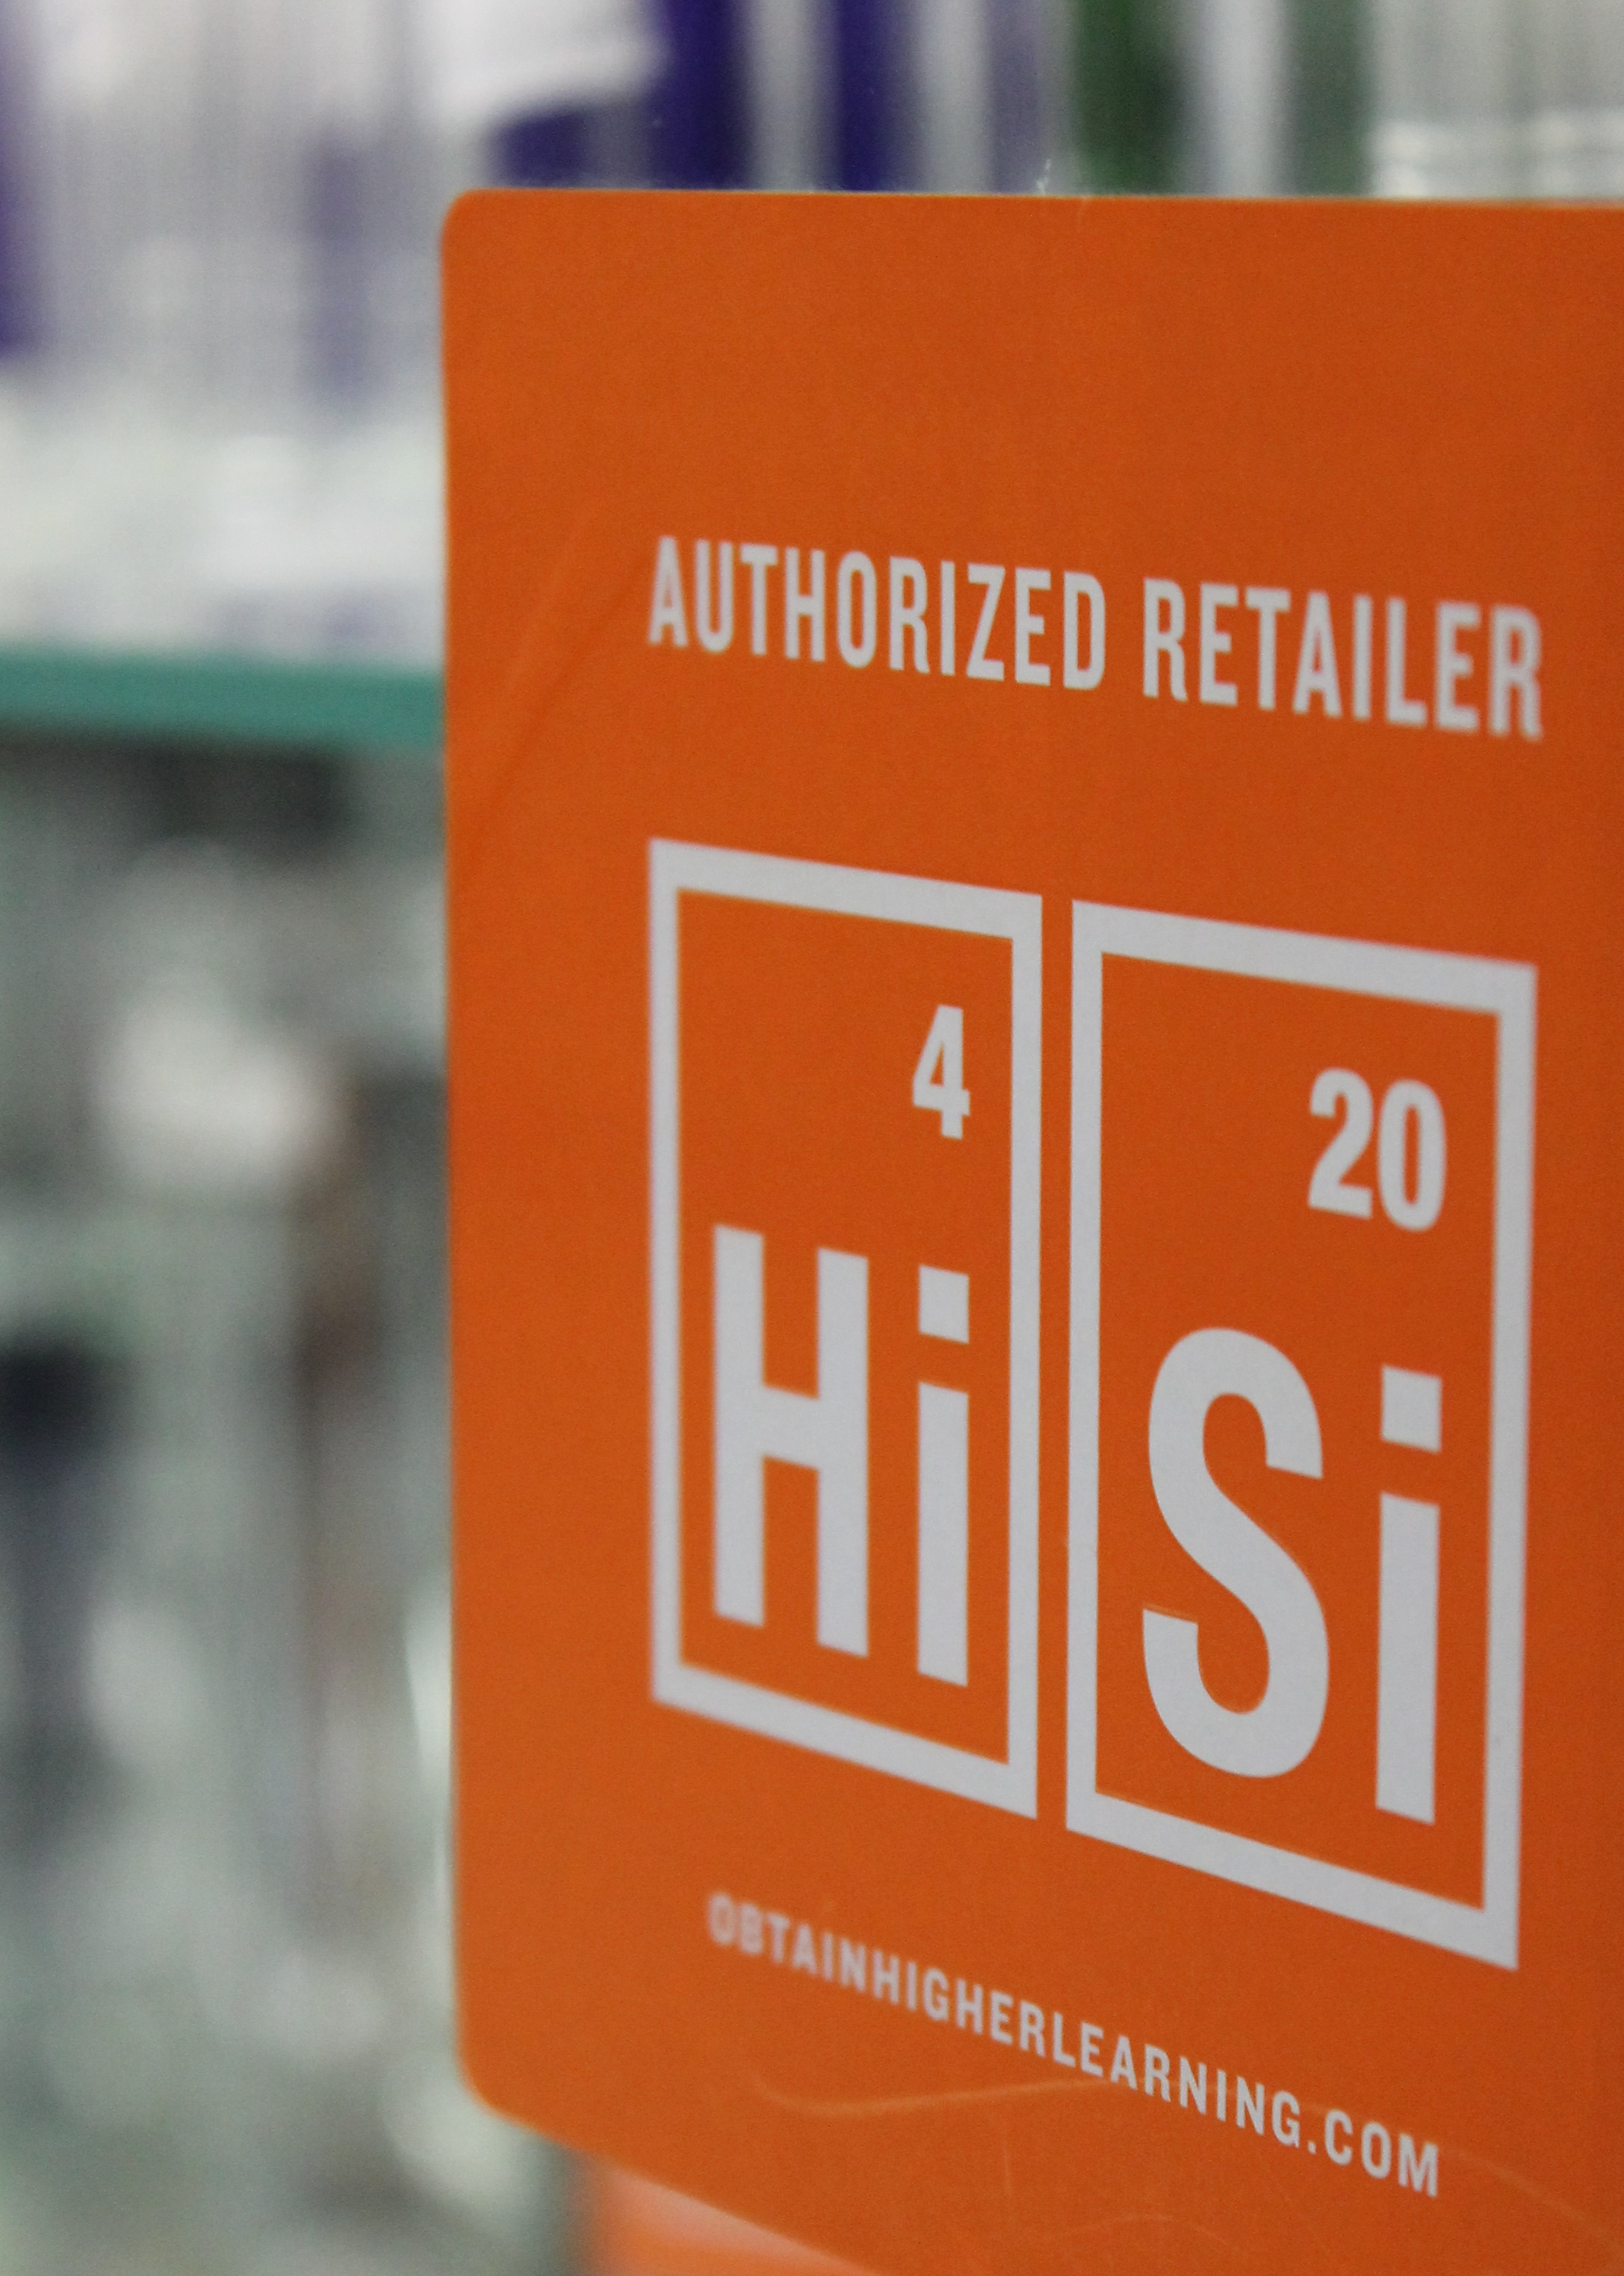 HiSi Authorized Retailer